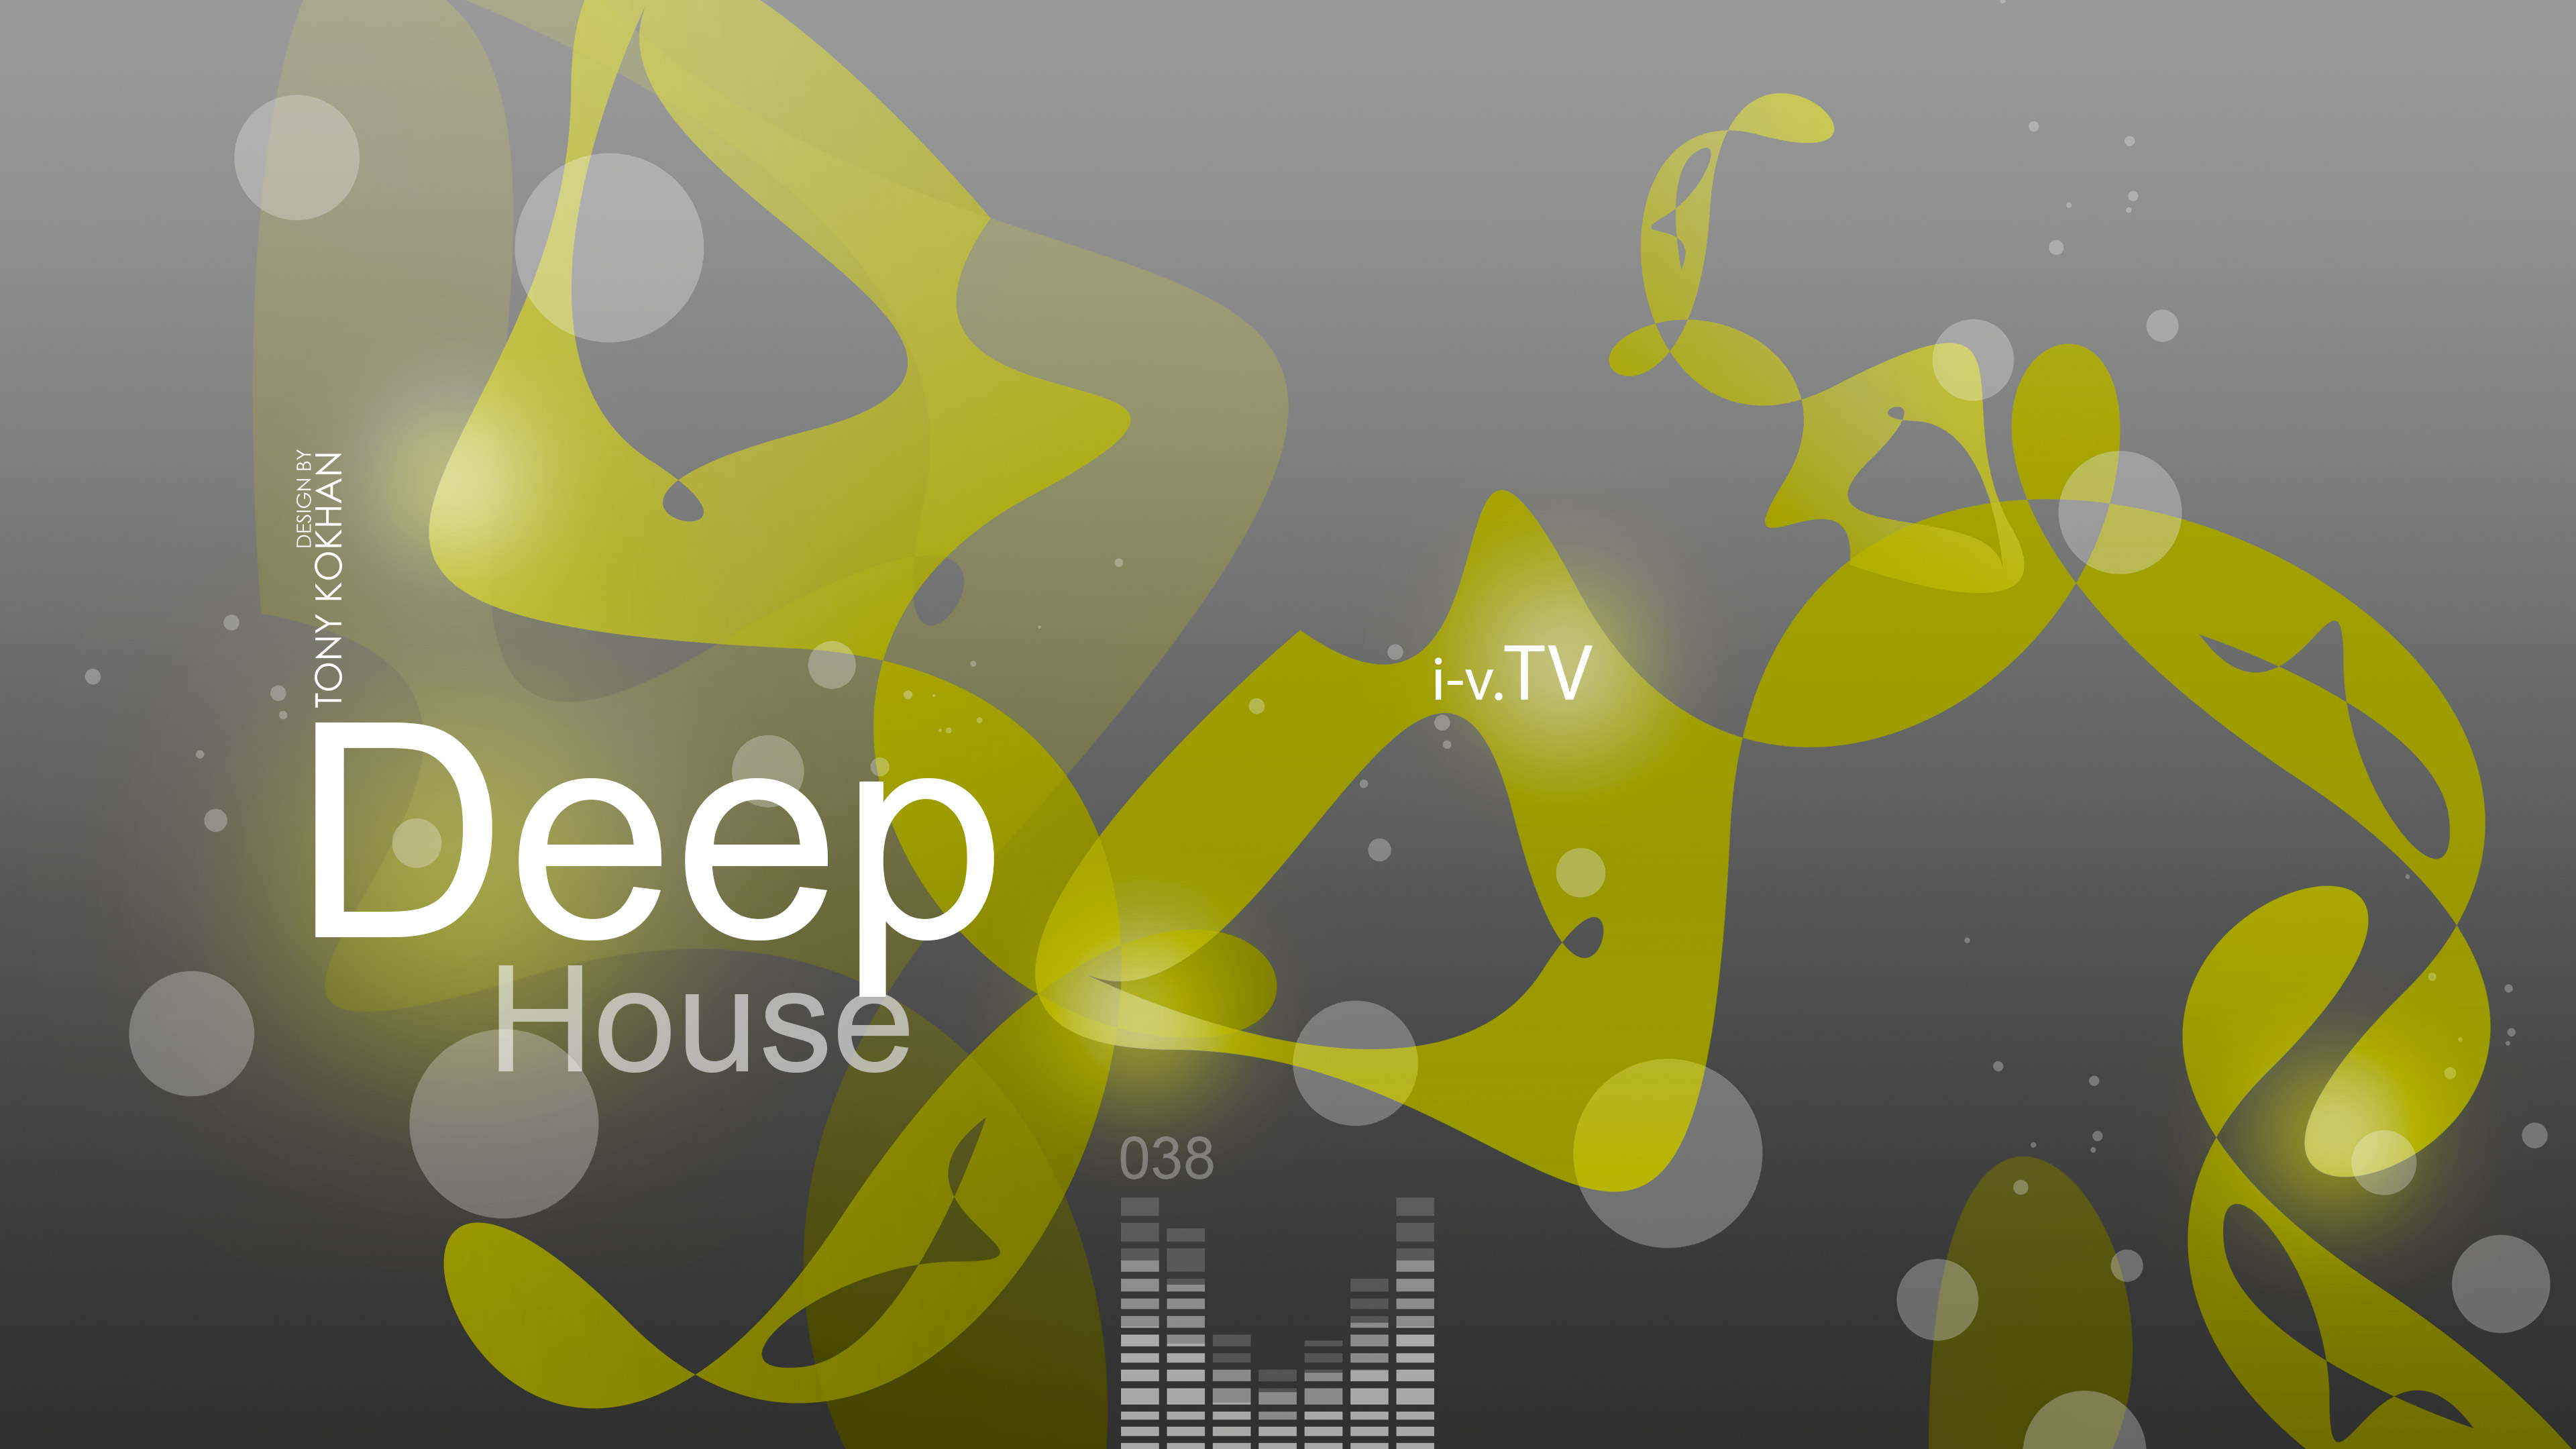 Deep House Music eQ SC Thirty Eight 2015 Tony Kokhan Sound 3840x2160